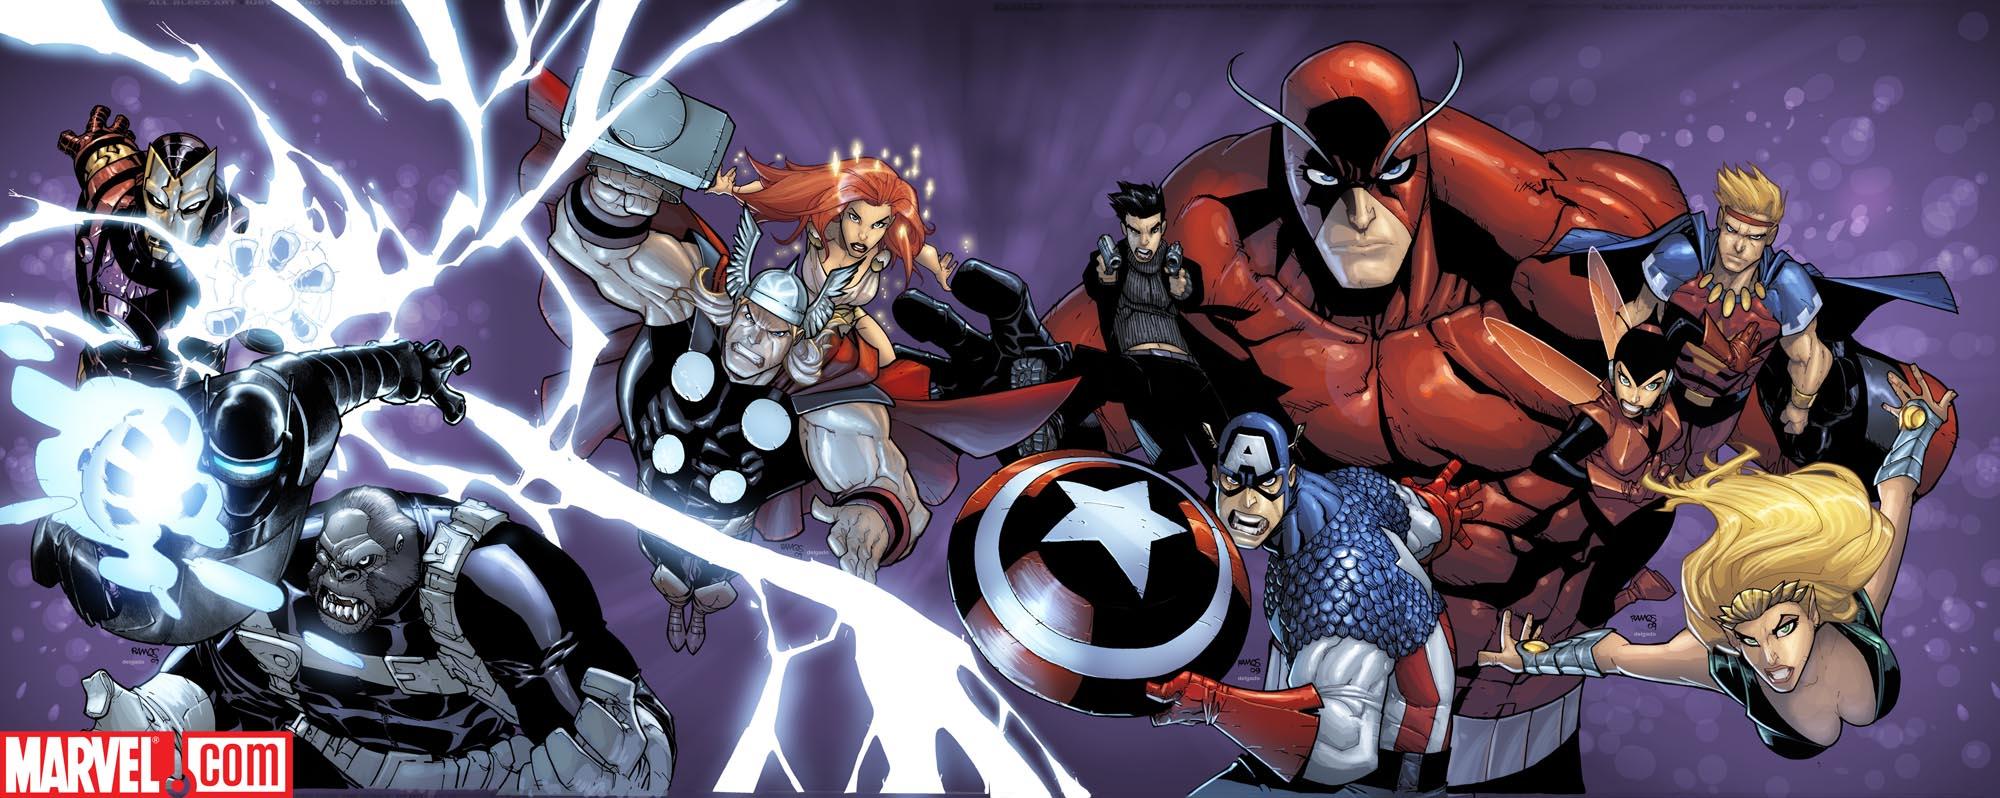 Avengers-humberto-Ramos